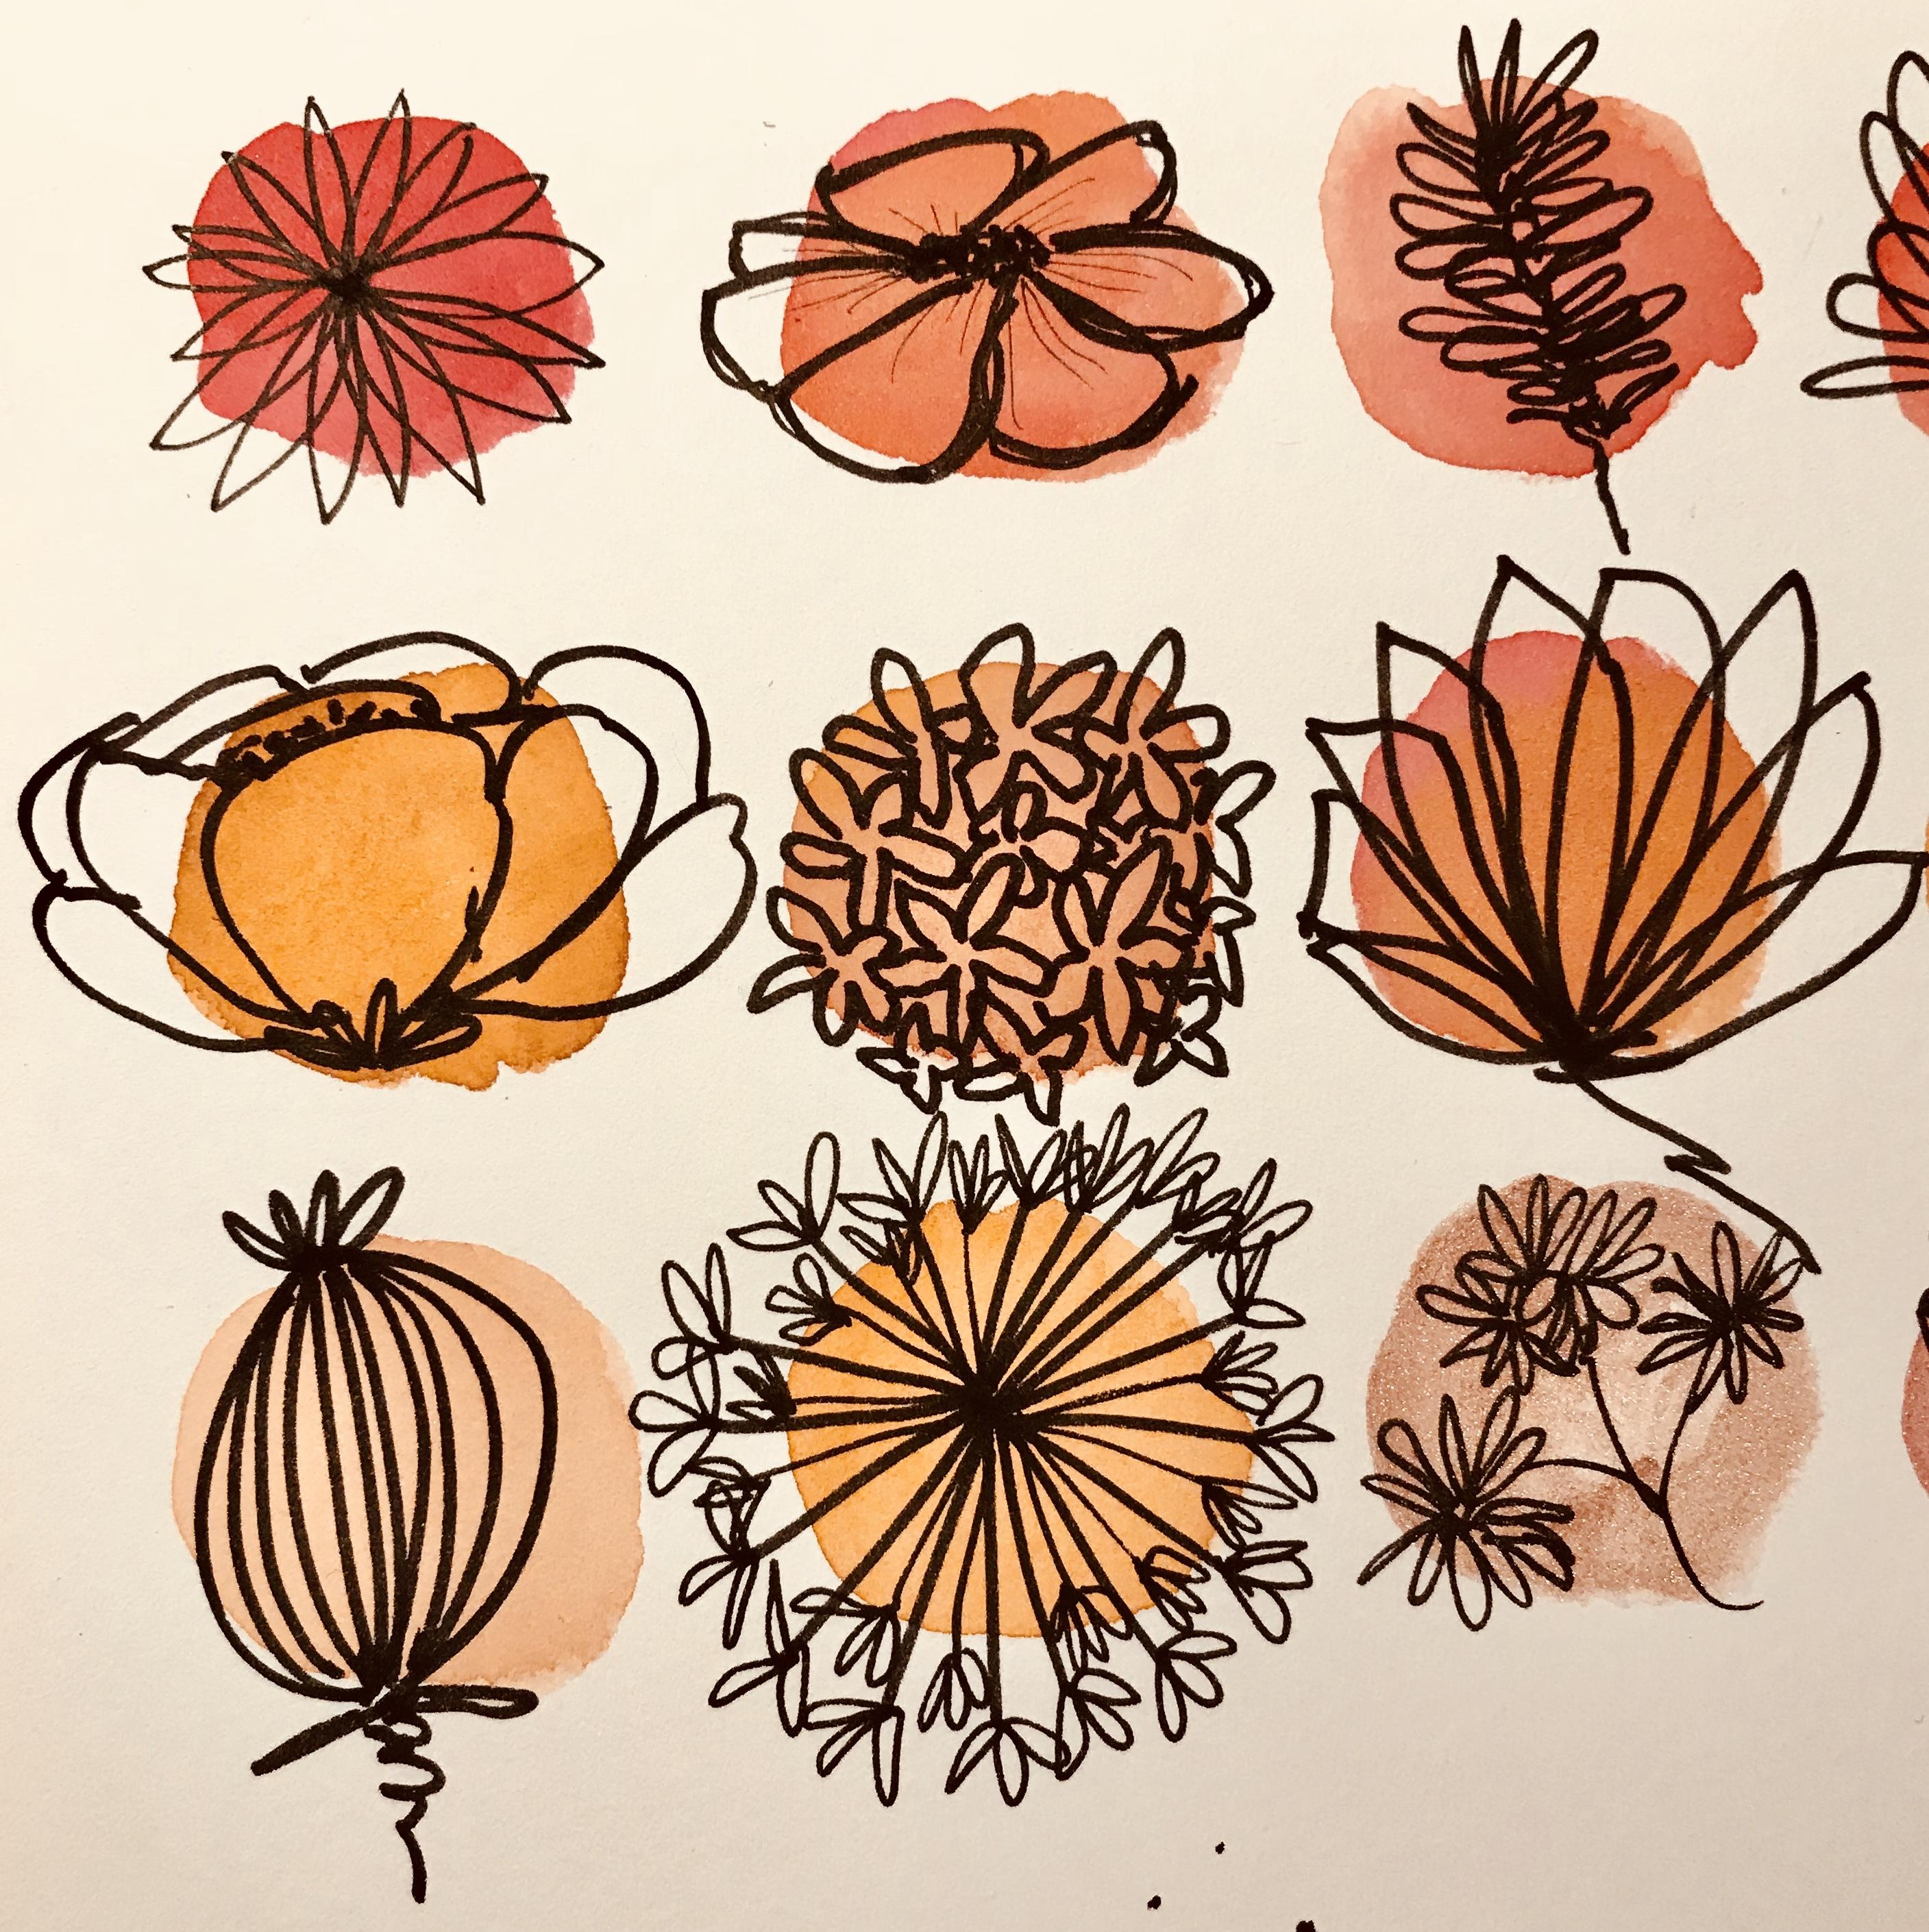 #creativity #creativité #flowerdesign #fleurs #dessin